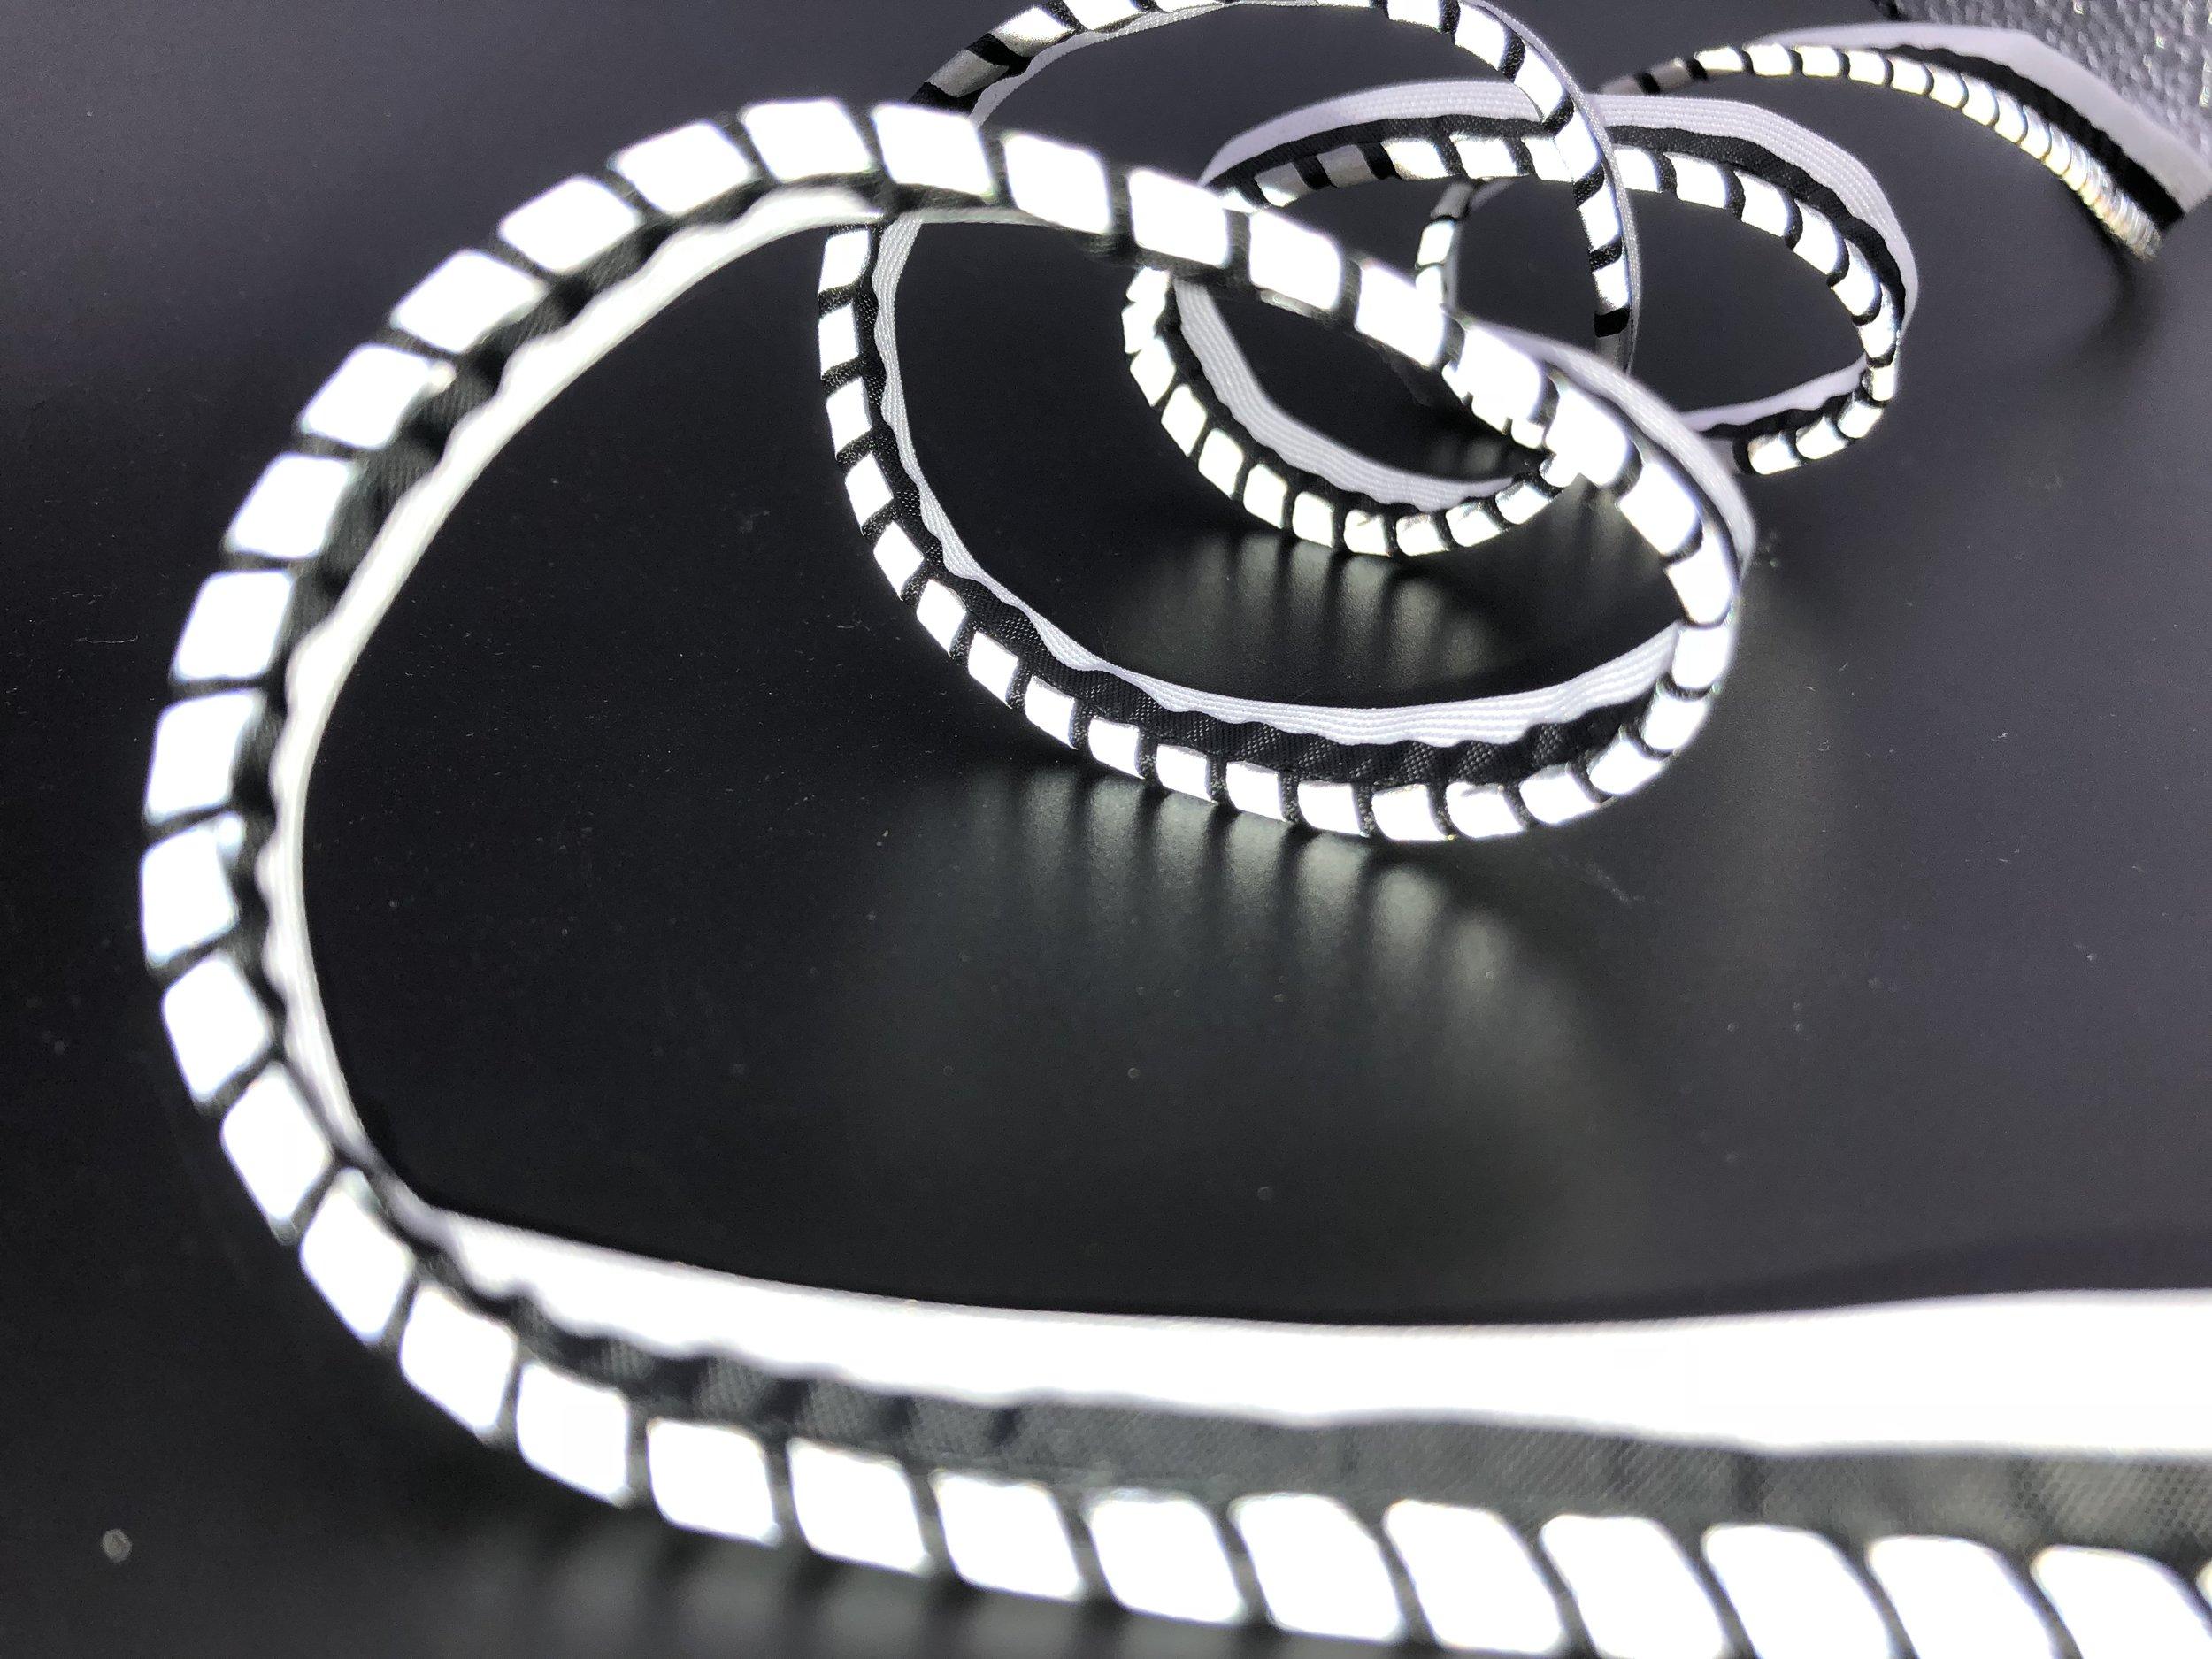 Copy of Segmented reflective piping - flash